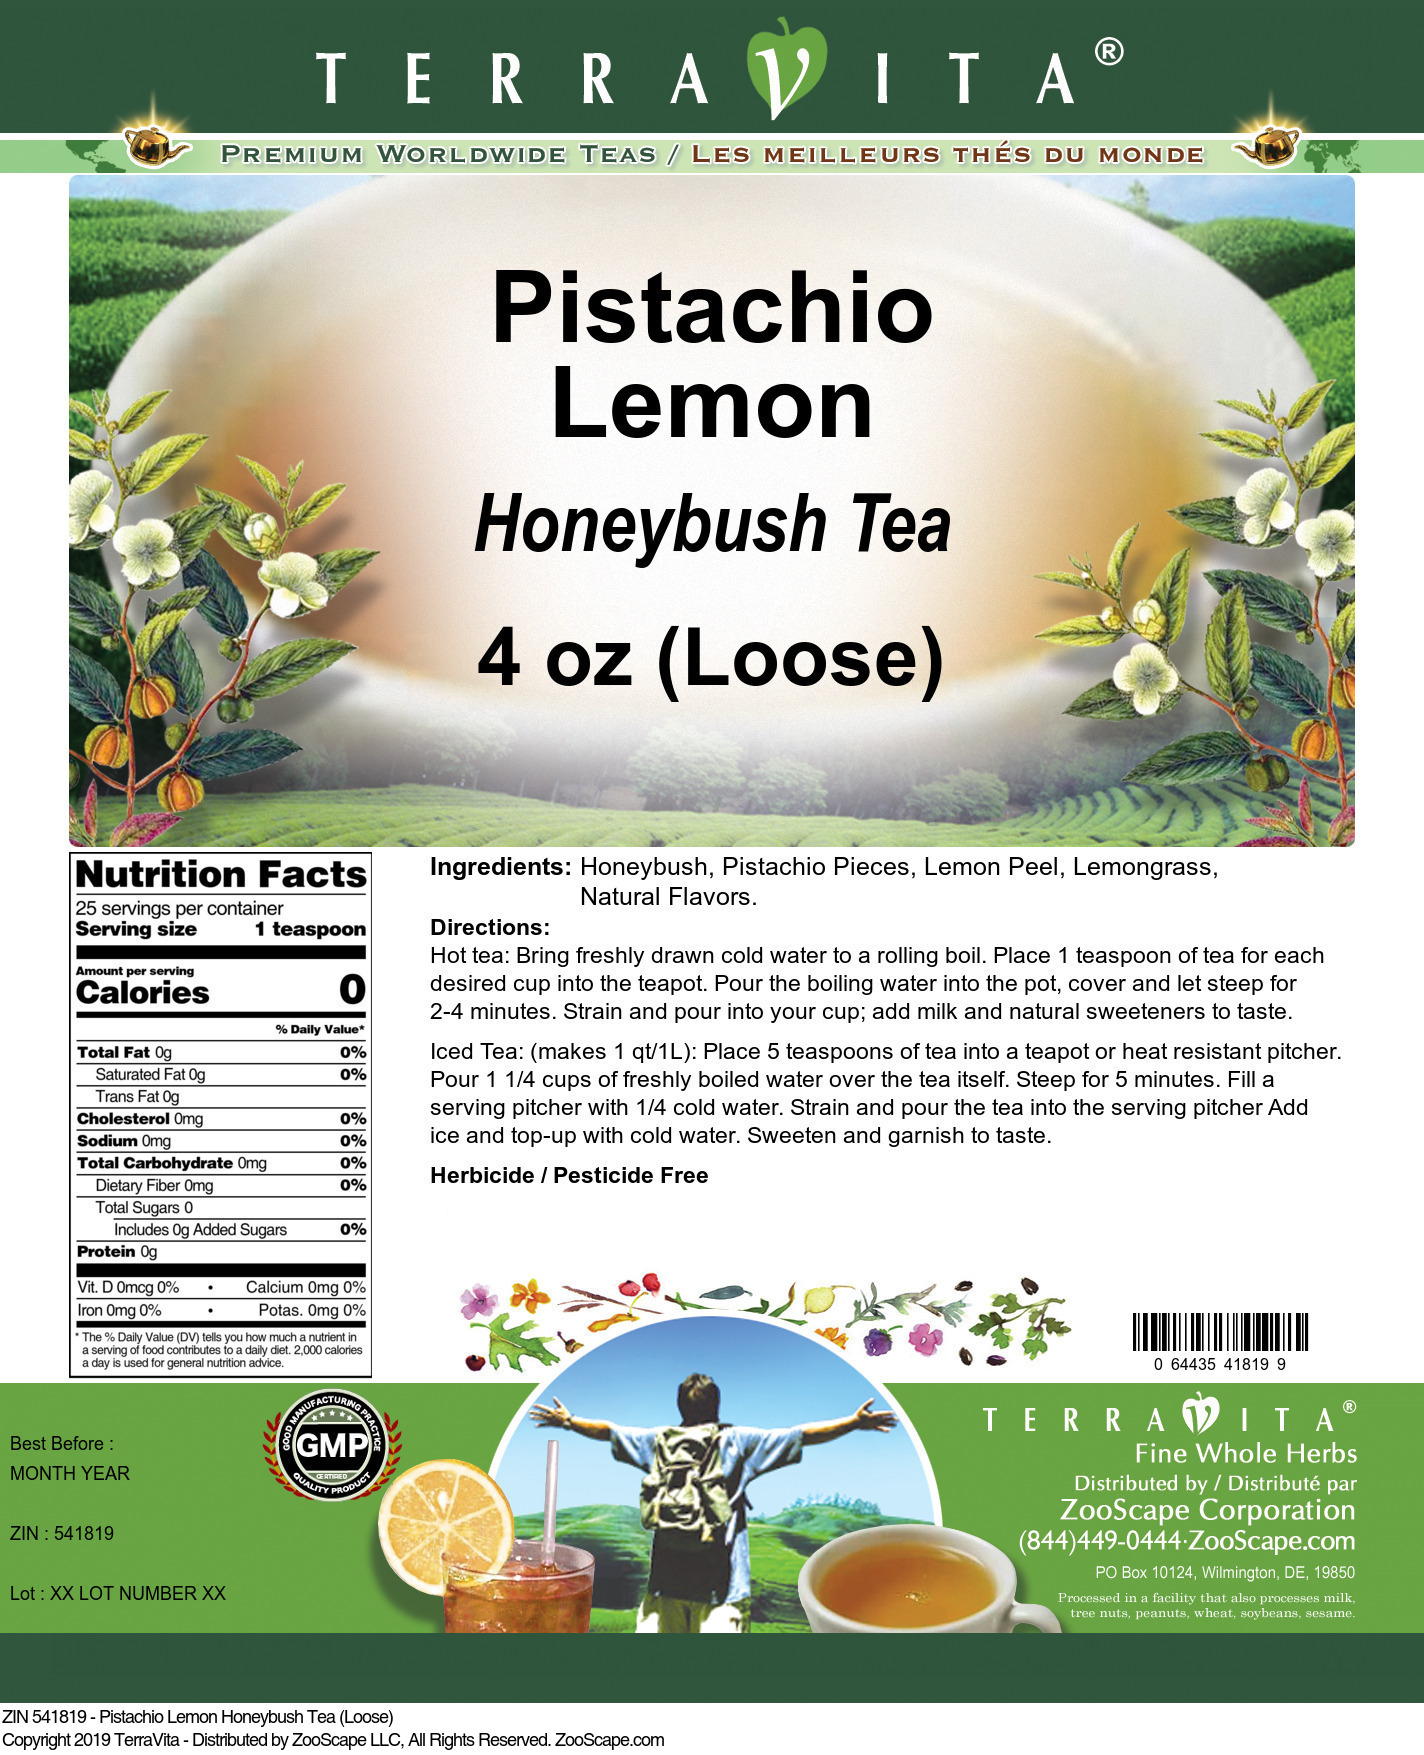 Pistachio Lemon Honeybush Tea (Loose)